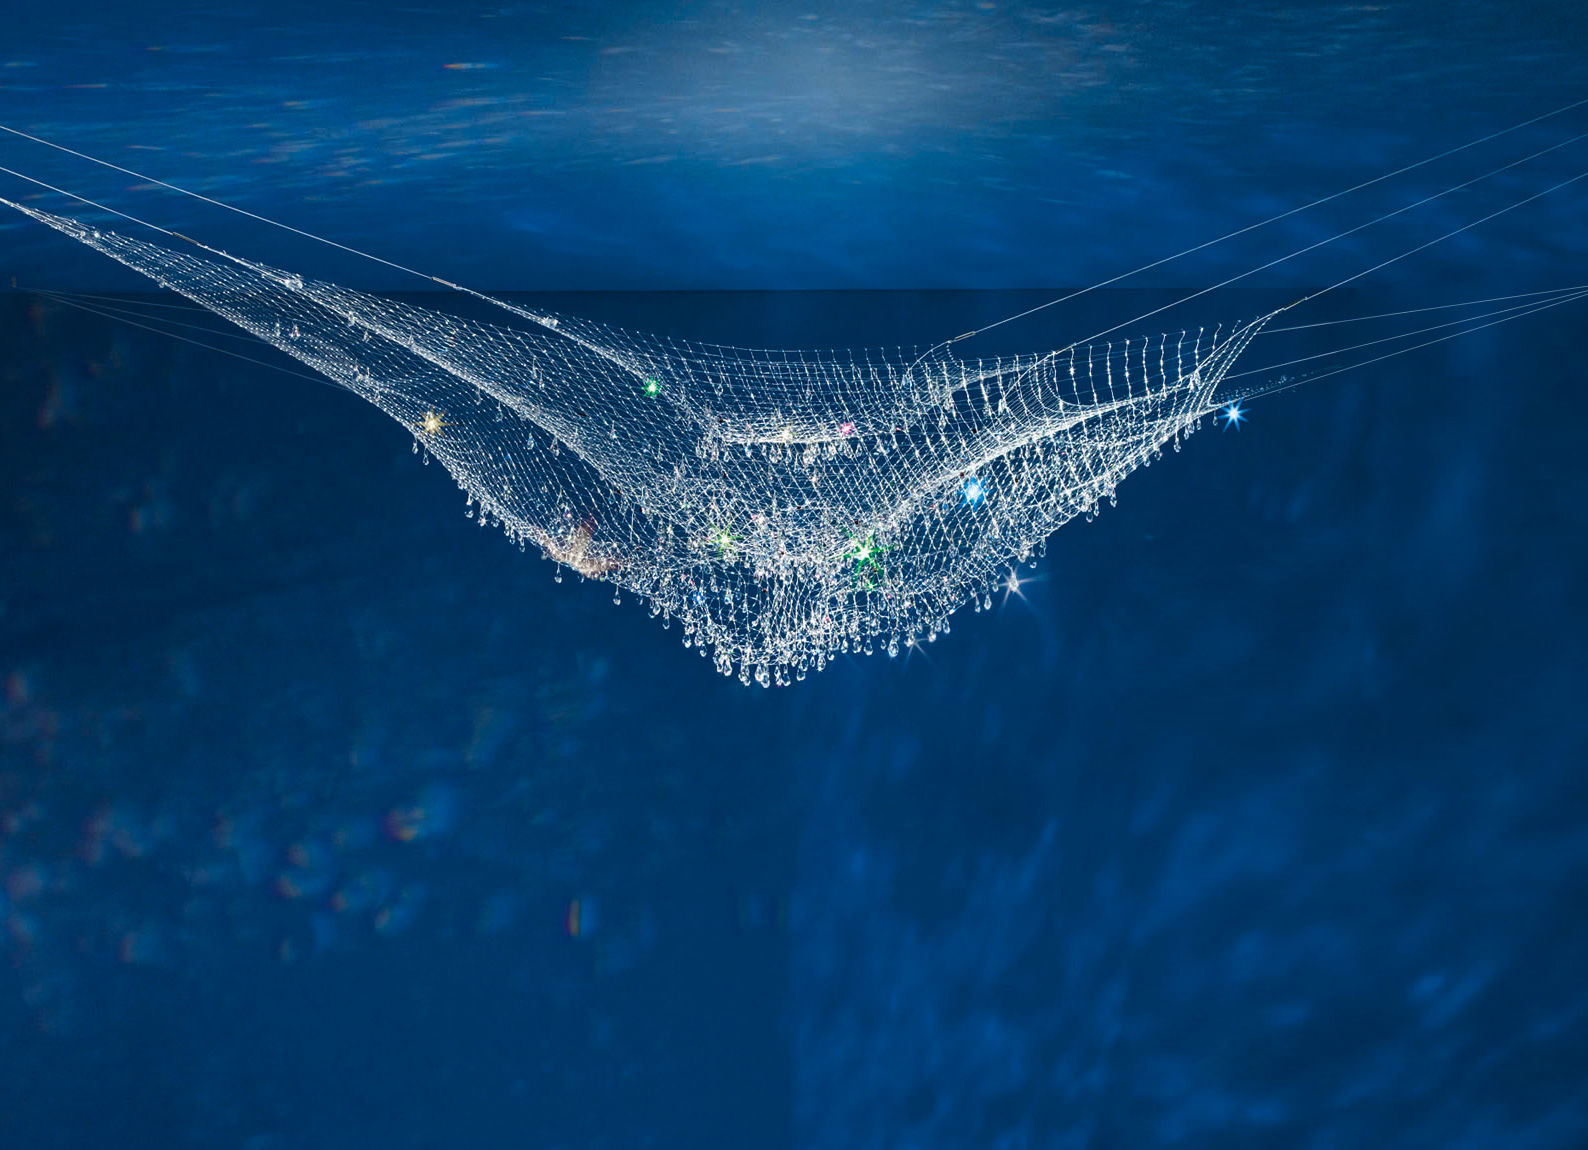 Leuchten - Pendelleuchten - Lacrime del Pescatore Pendelleuchte - Ingo Maurer - Mehrfarbig - Kristall, Nylon